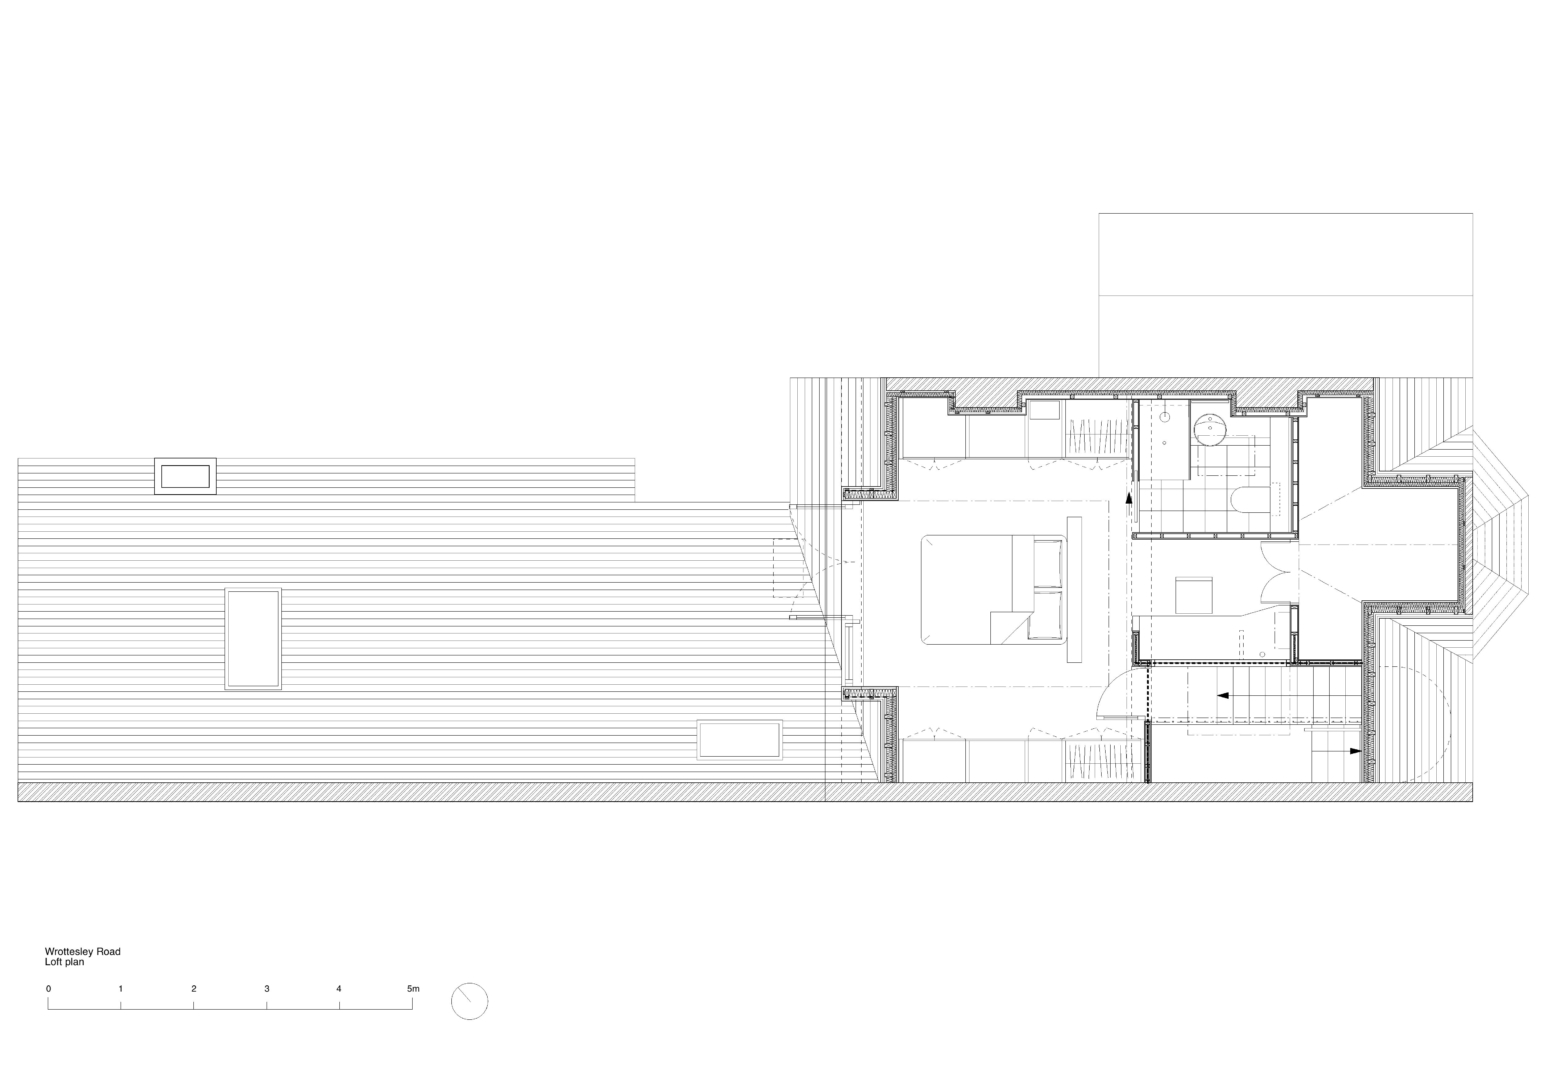 Wrottesley Road loft plan